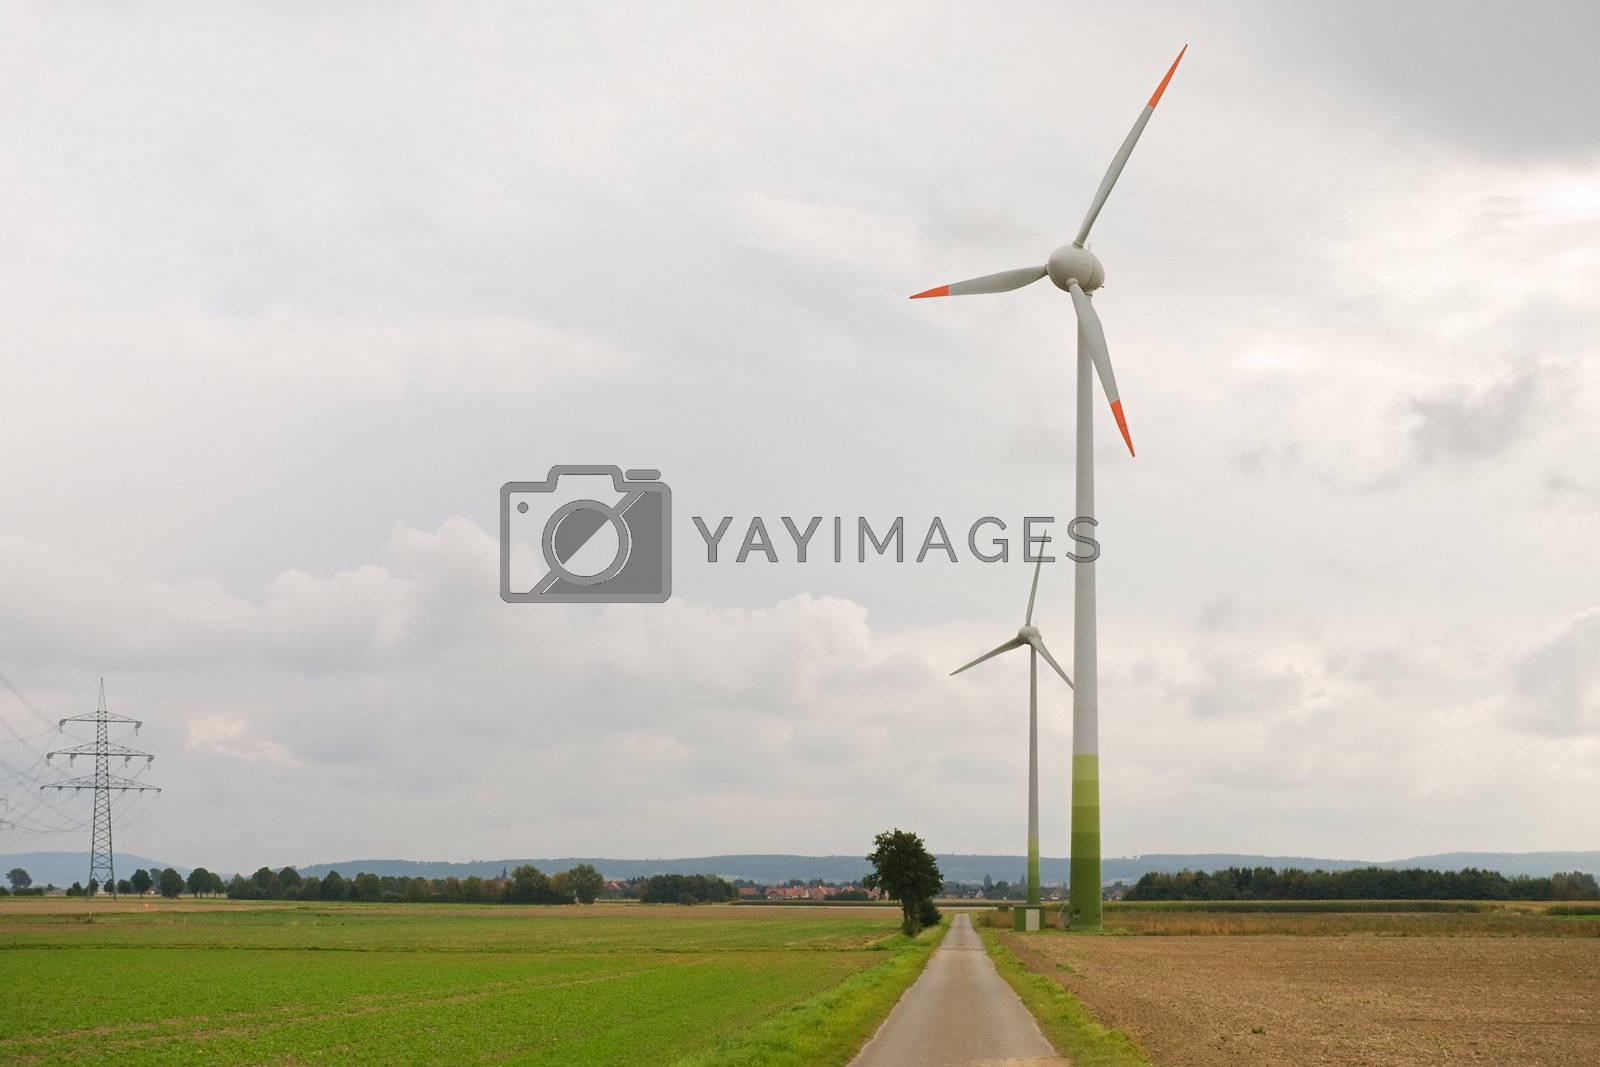 Wind Turbines at the rural field near the road